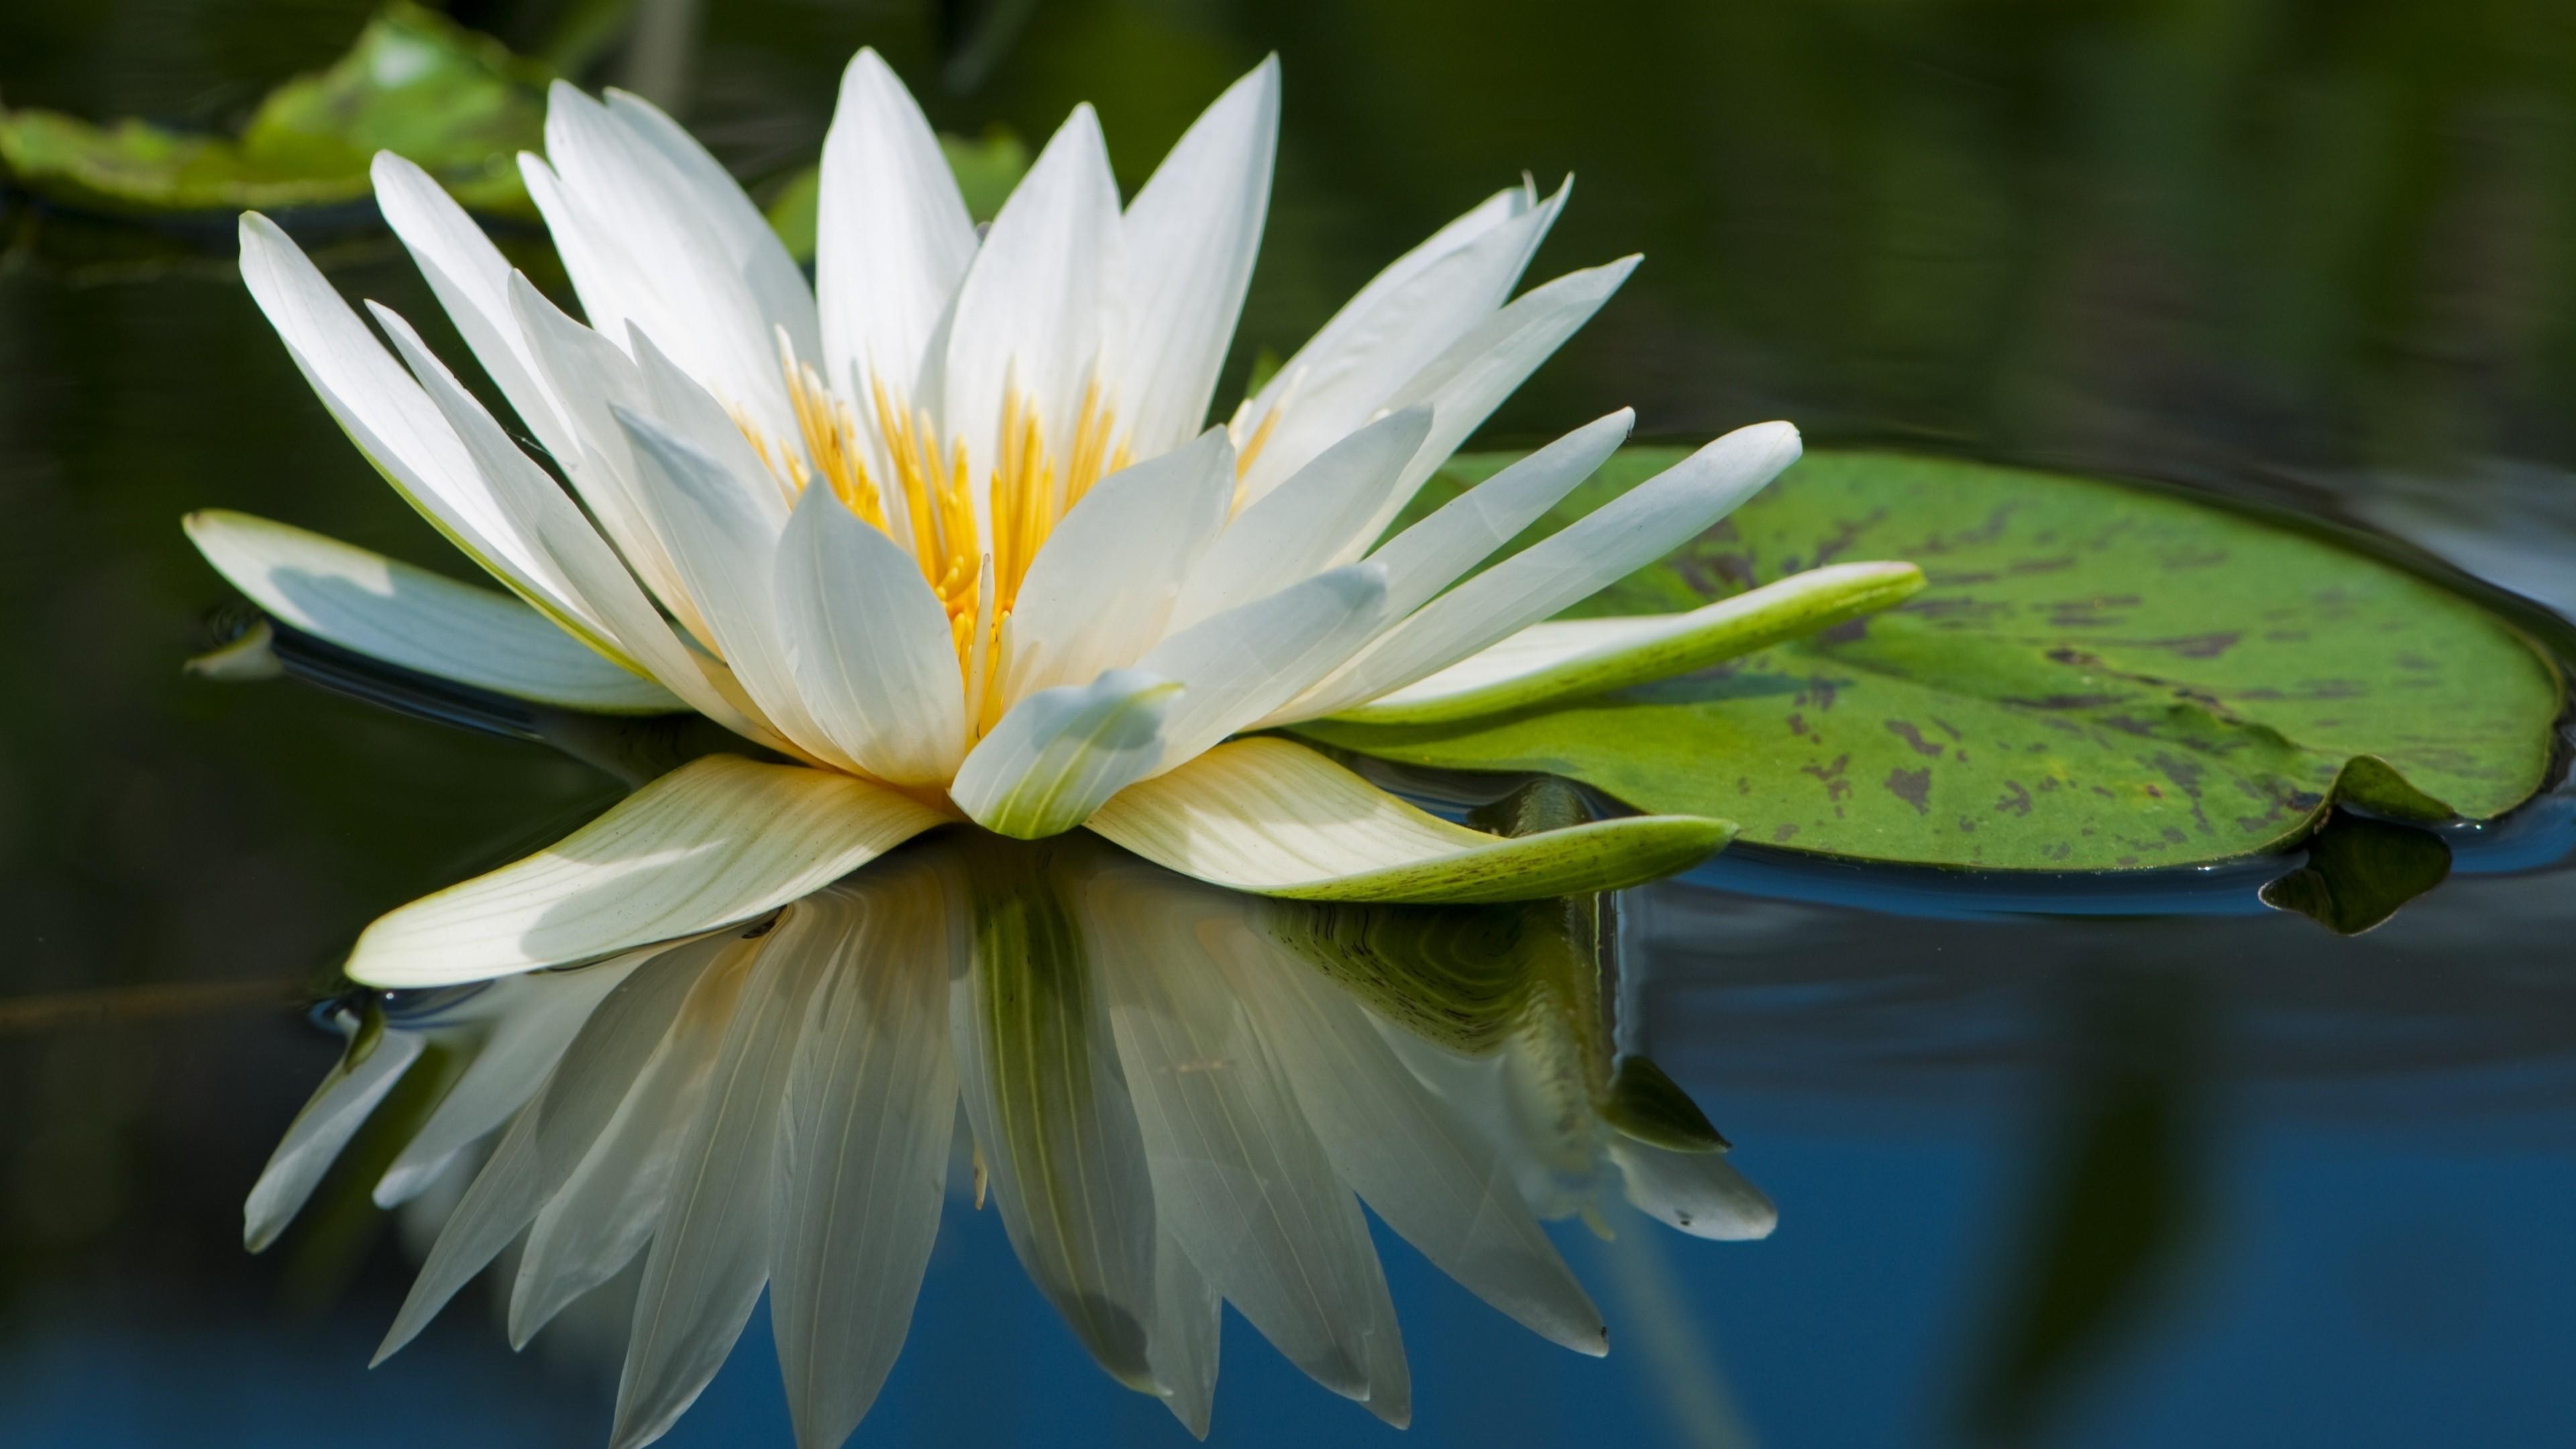 3d Wallpapers Buy Online Wallpaper Lotus 5k 4k Wallpaper Flowers Lake River